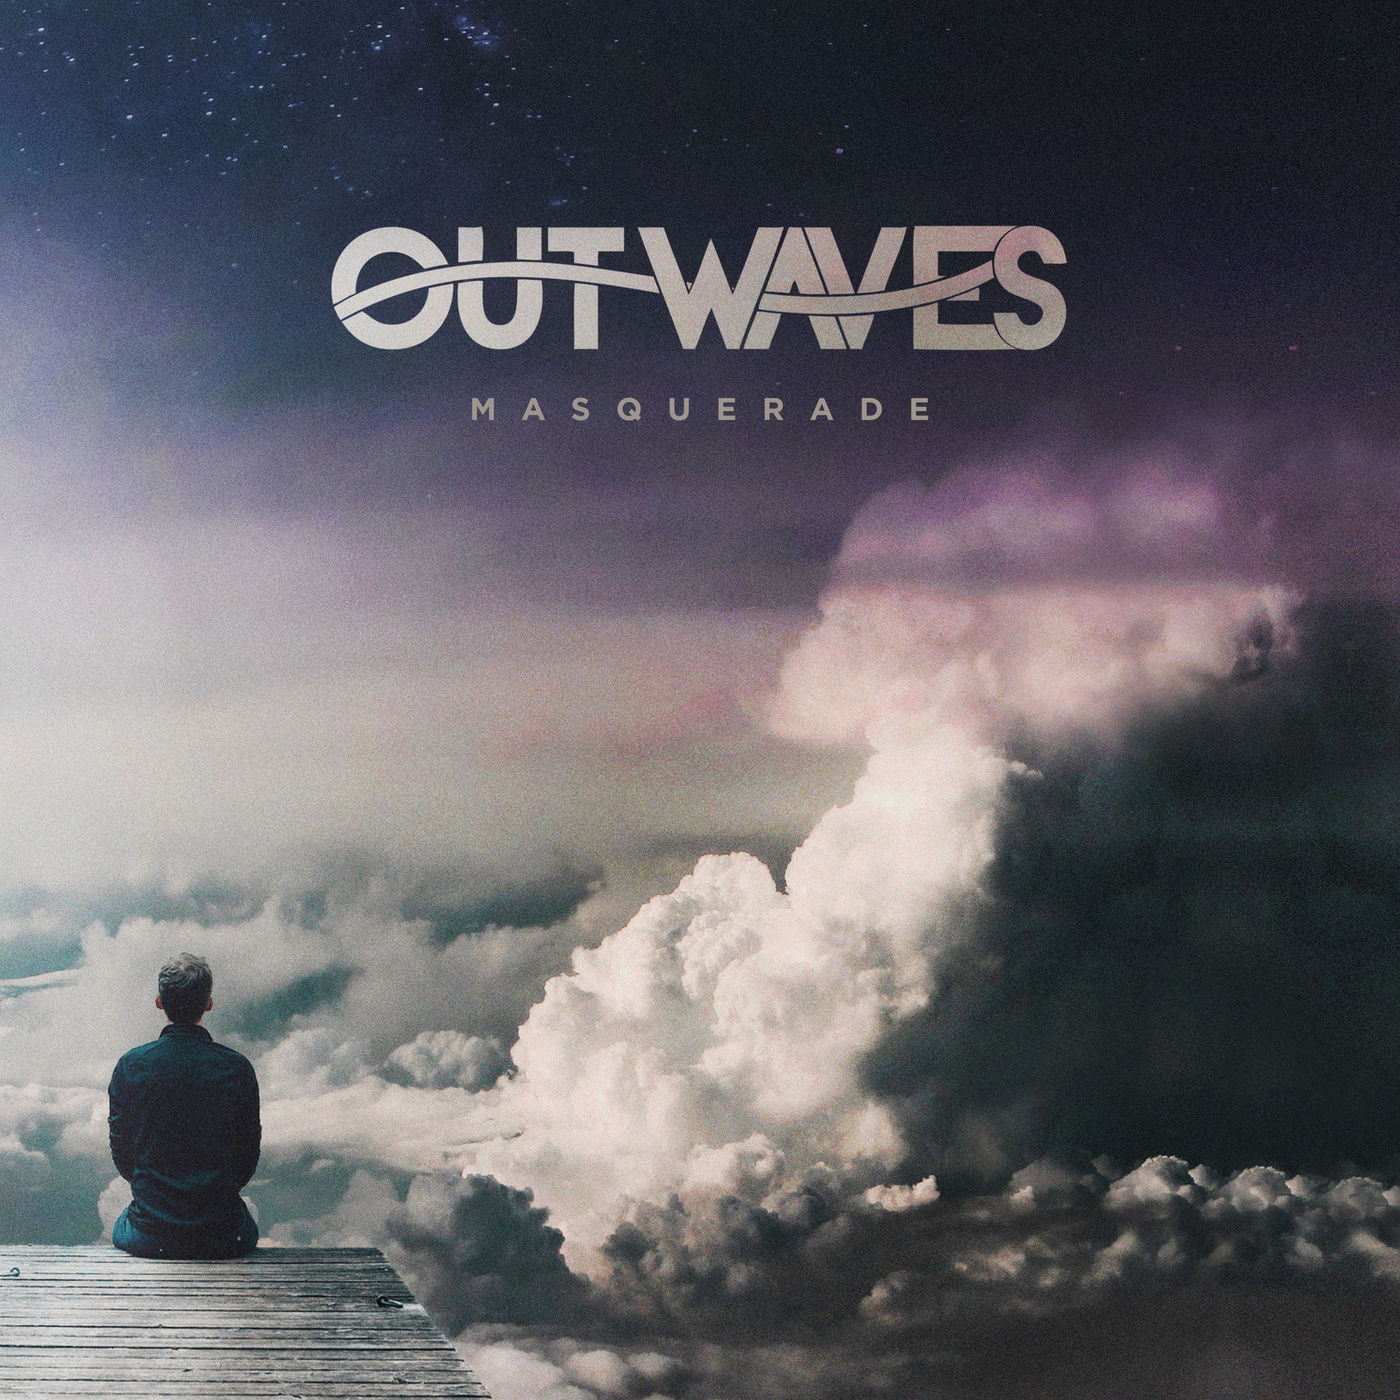 Outwaves - Masquerade [single] (2020)